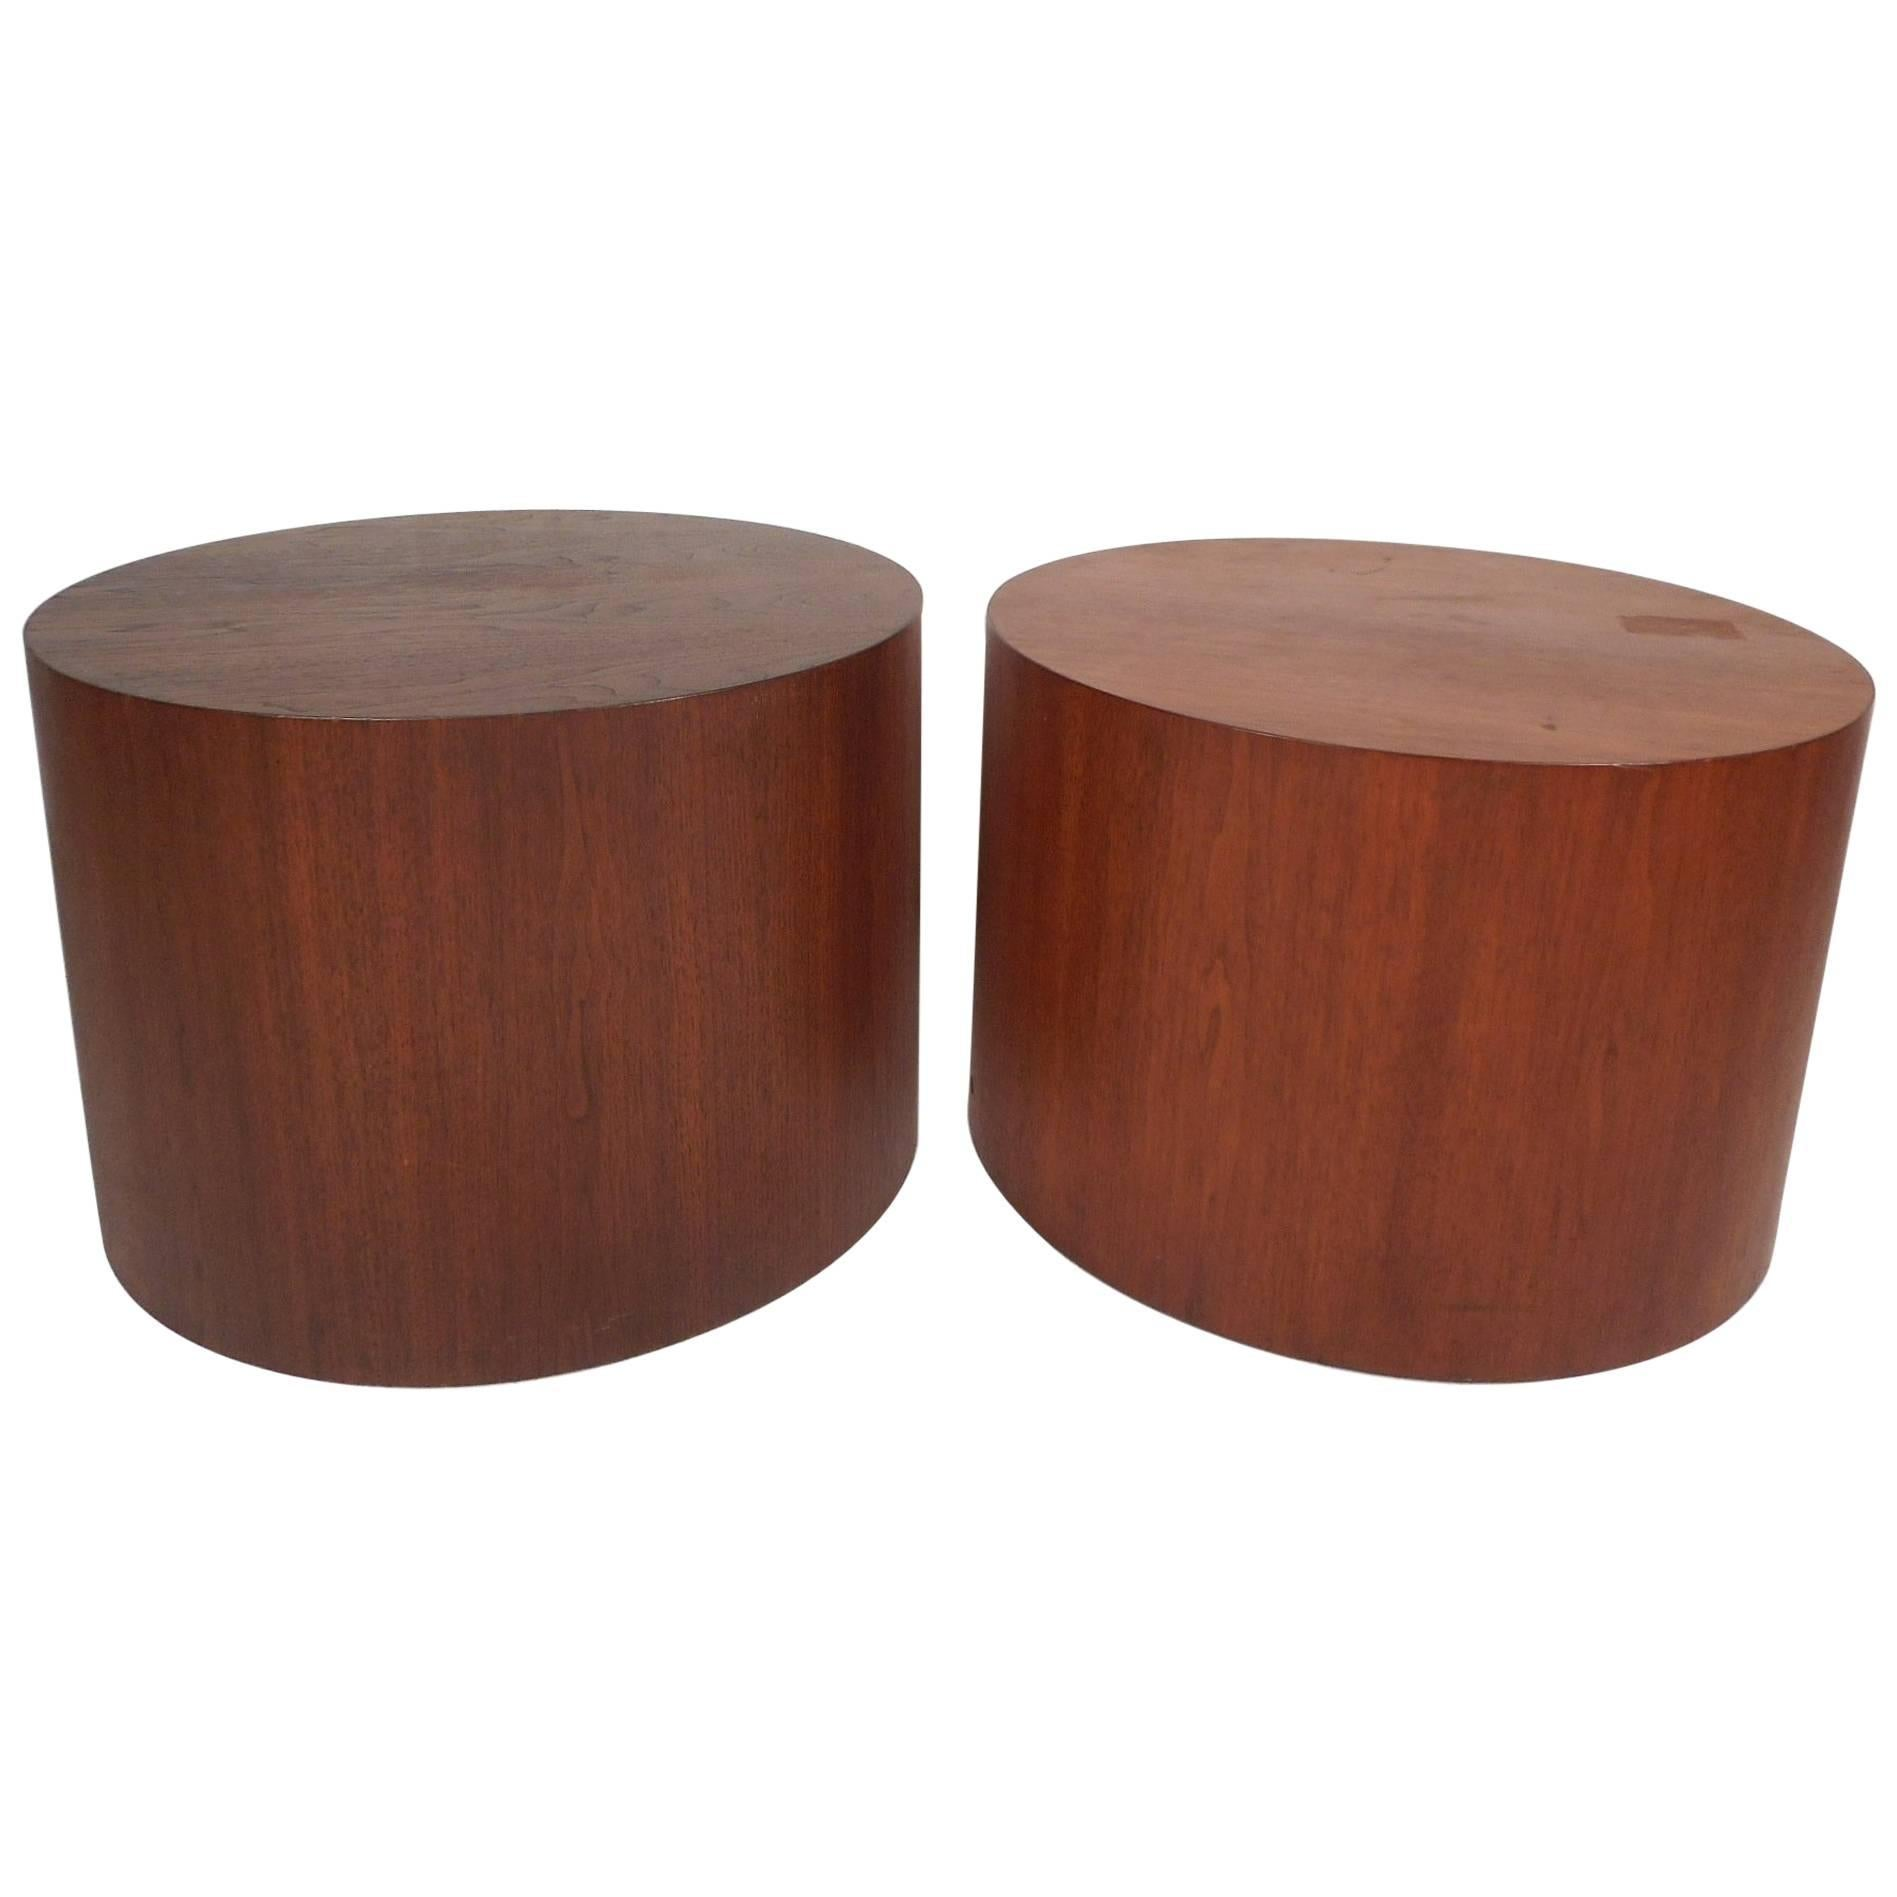 Unique Mid-Century Modern Round Walnut End Tables